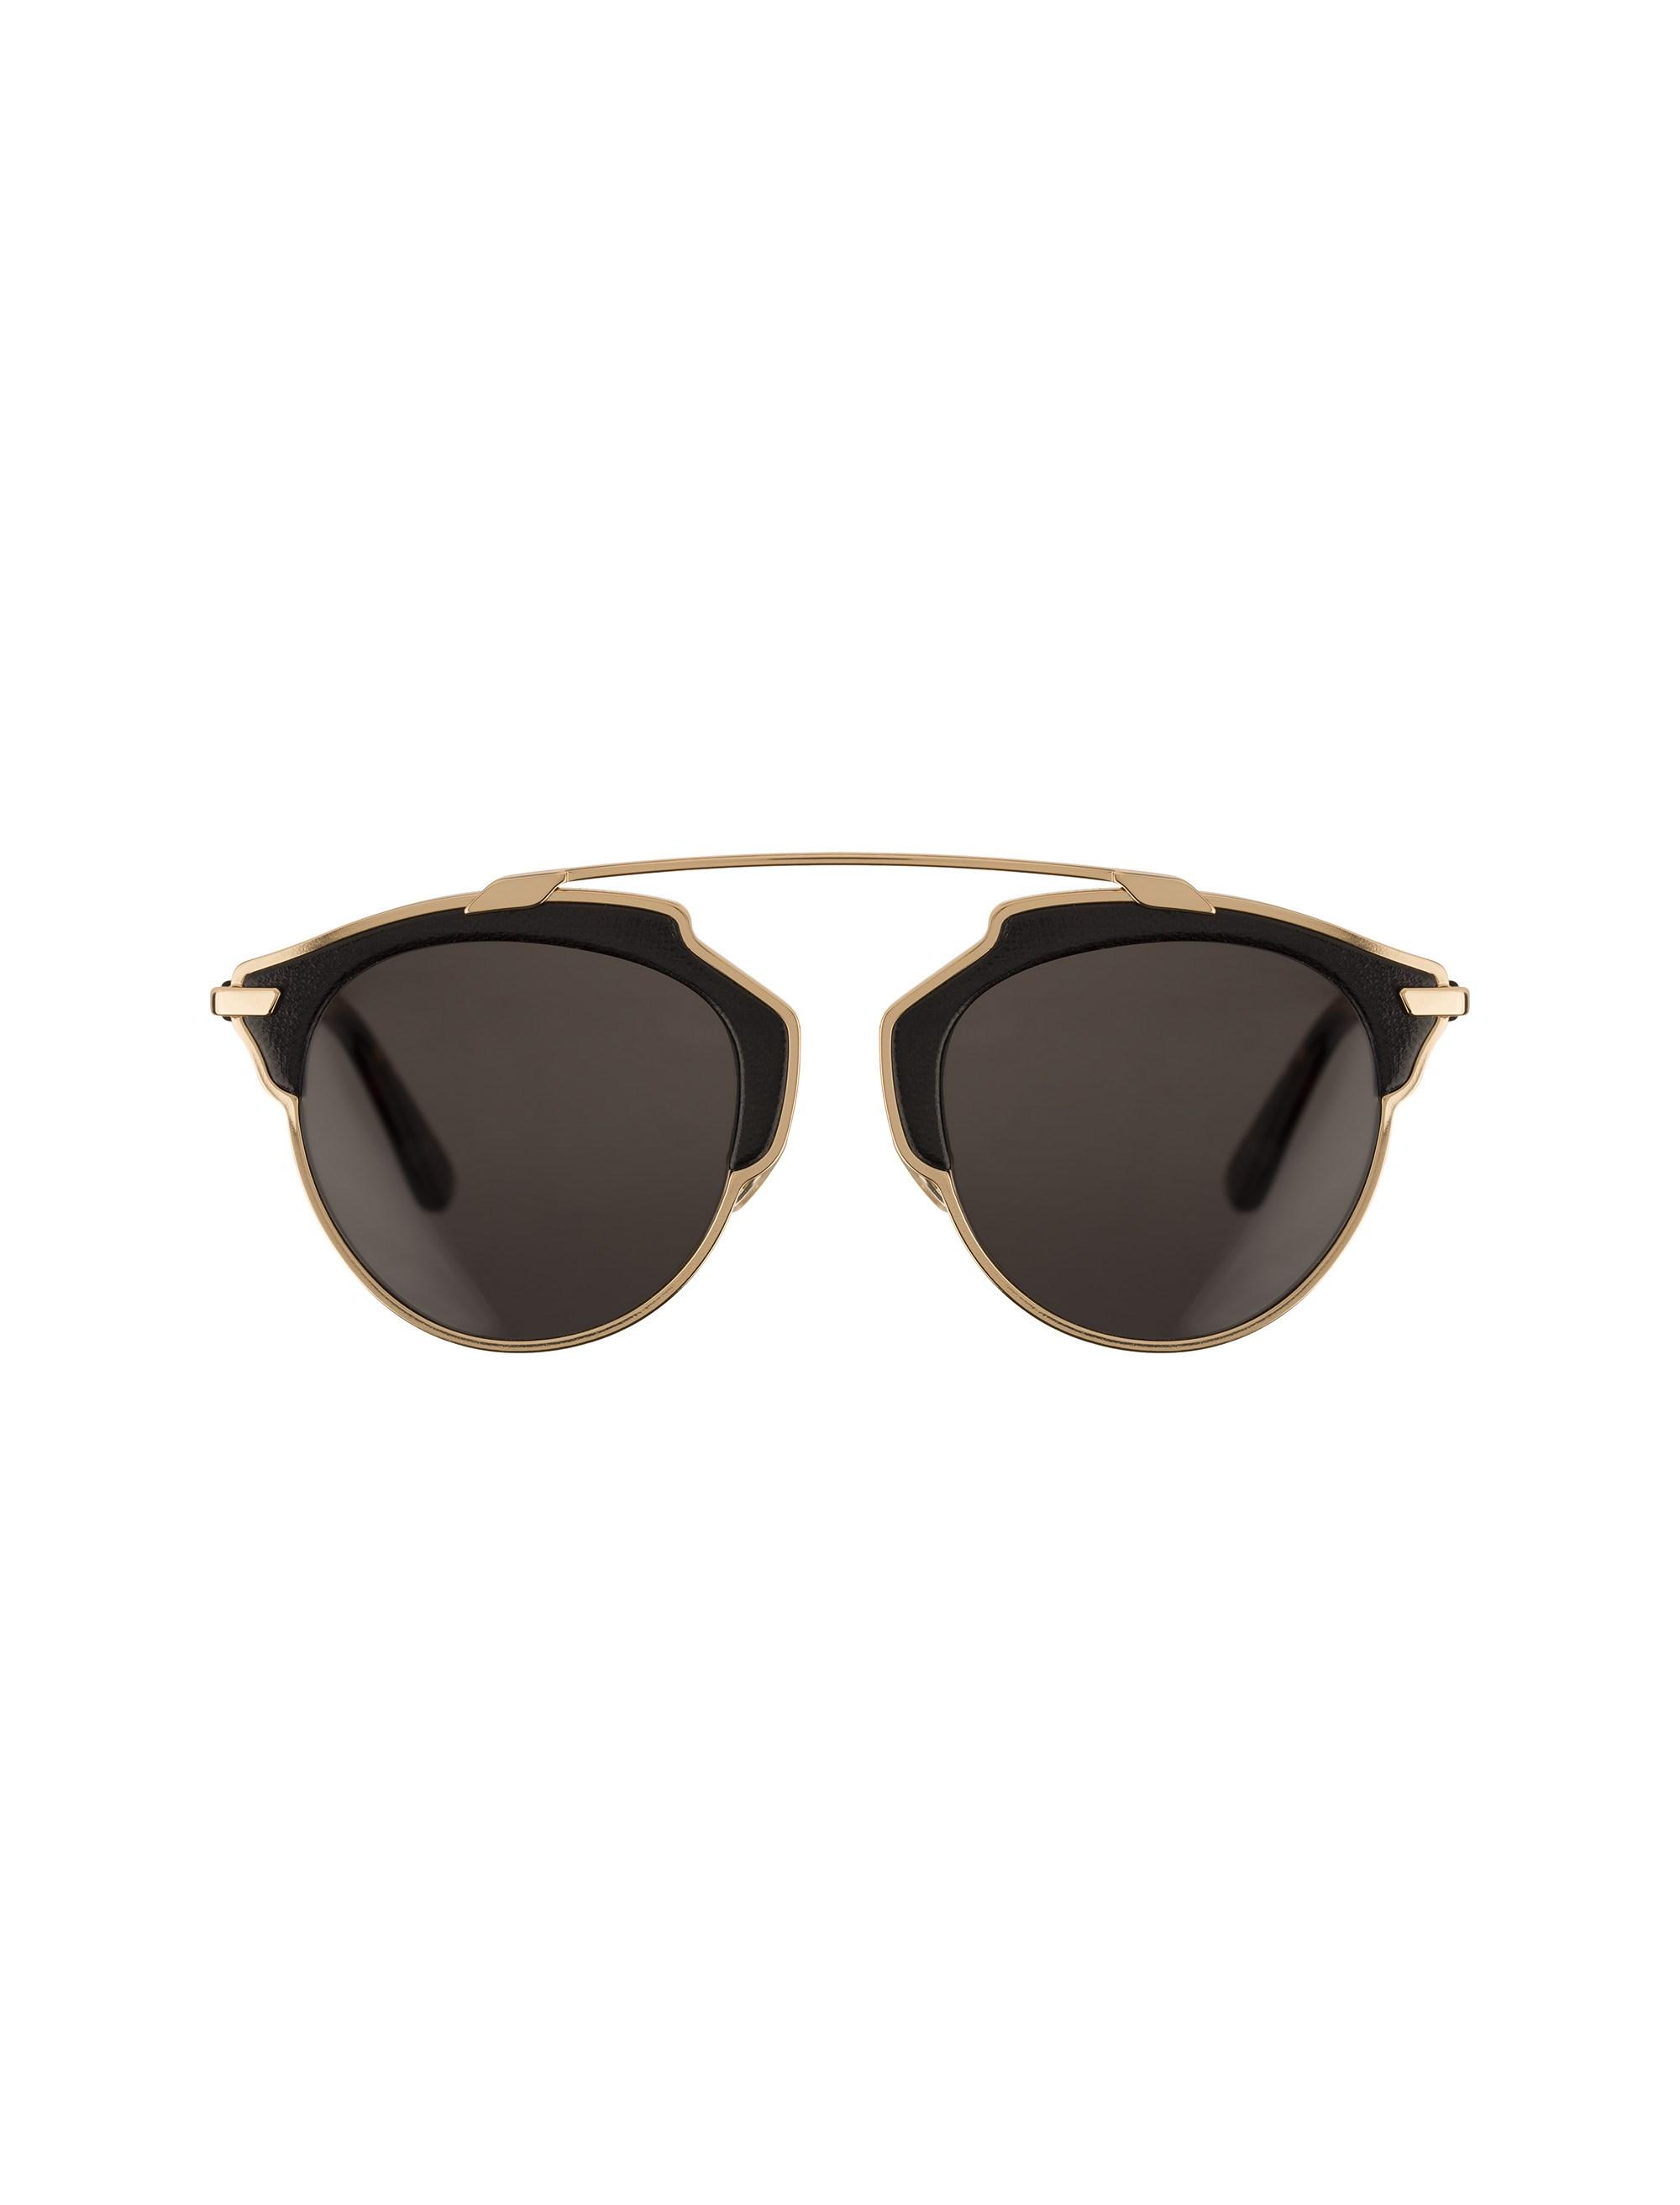 قیمت عینک آفتابی پنتوس زنانه - دیور